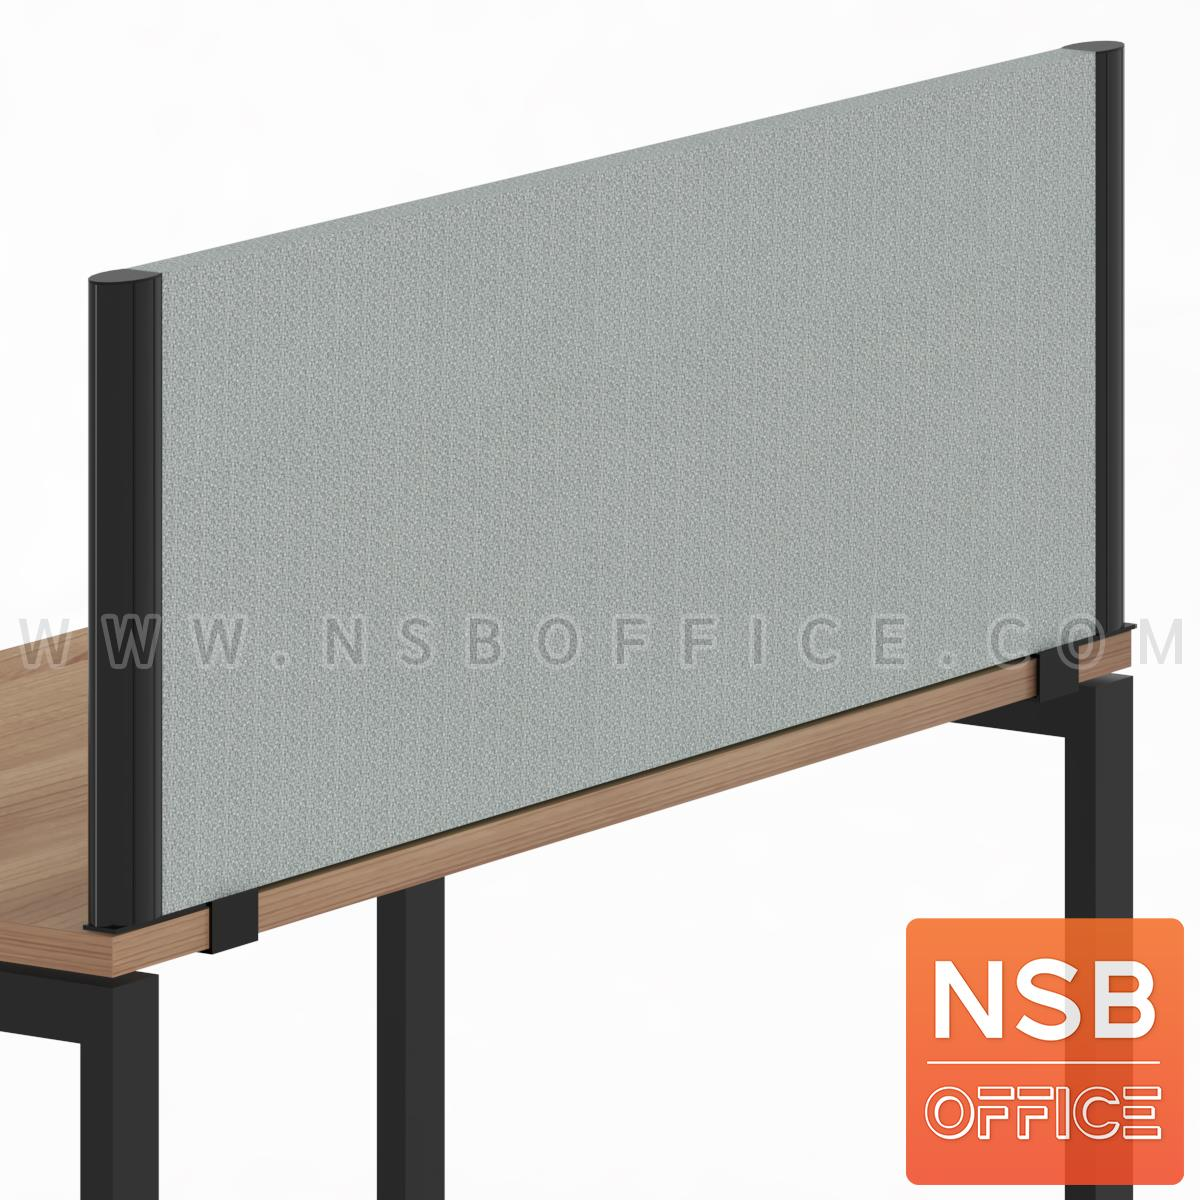 P04A002:มินิสกรีนกั้นโต๊ะทึบล้วน H40 cm  เฟรมอลูมินั่มรุ่นหนา 3 cm (ติดตั้งหนีบ top)